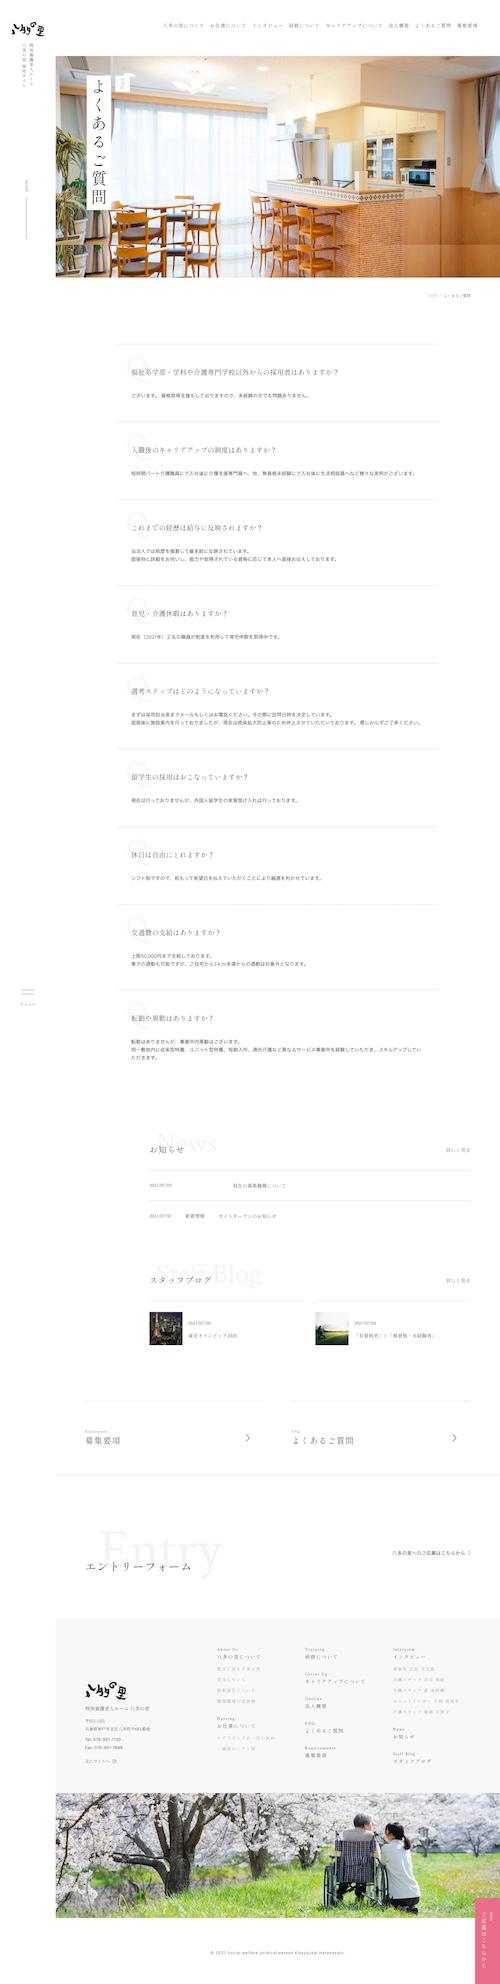 hatanosato-recruit-faq